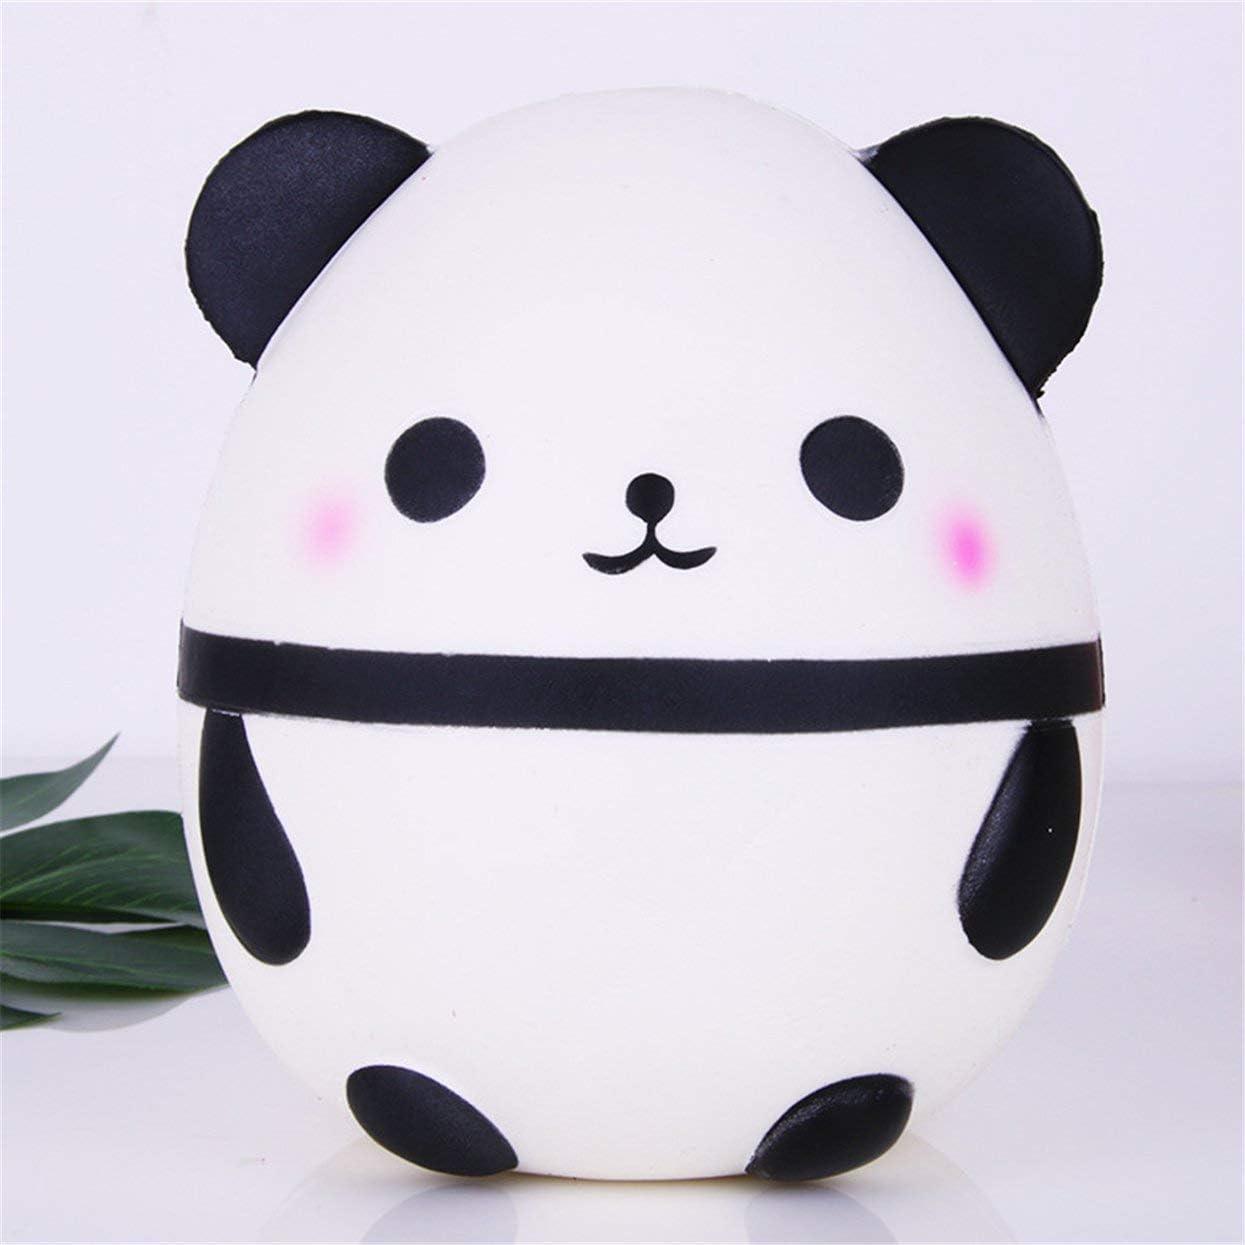 Tree-on-Life Anti-estr/és Squishy Simulaci/ón Panda Blanco Juguetes de Rebote Lento Divertido Infantil Squeeze Exquisita Colecci/ón Juguete Suave Ni/ños